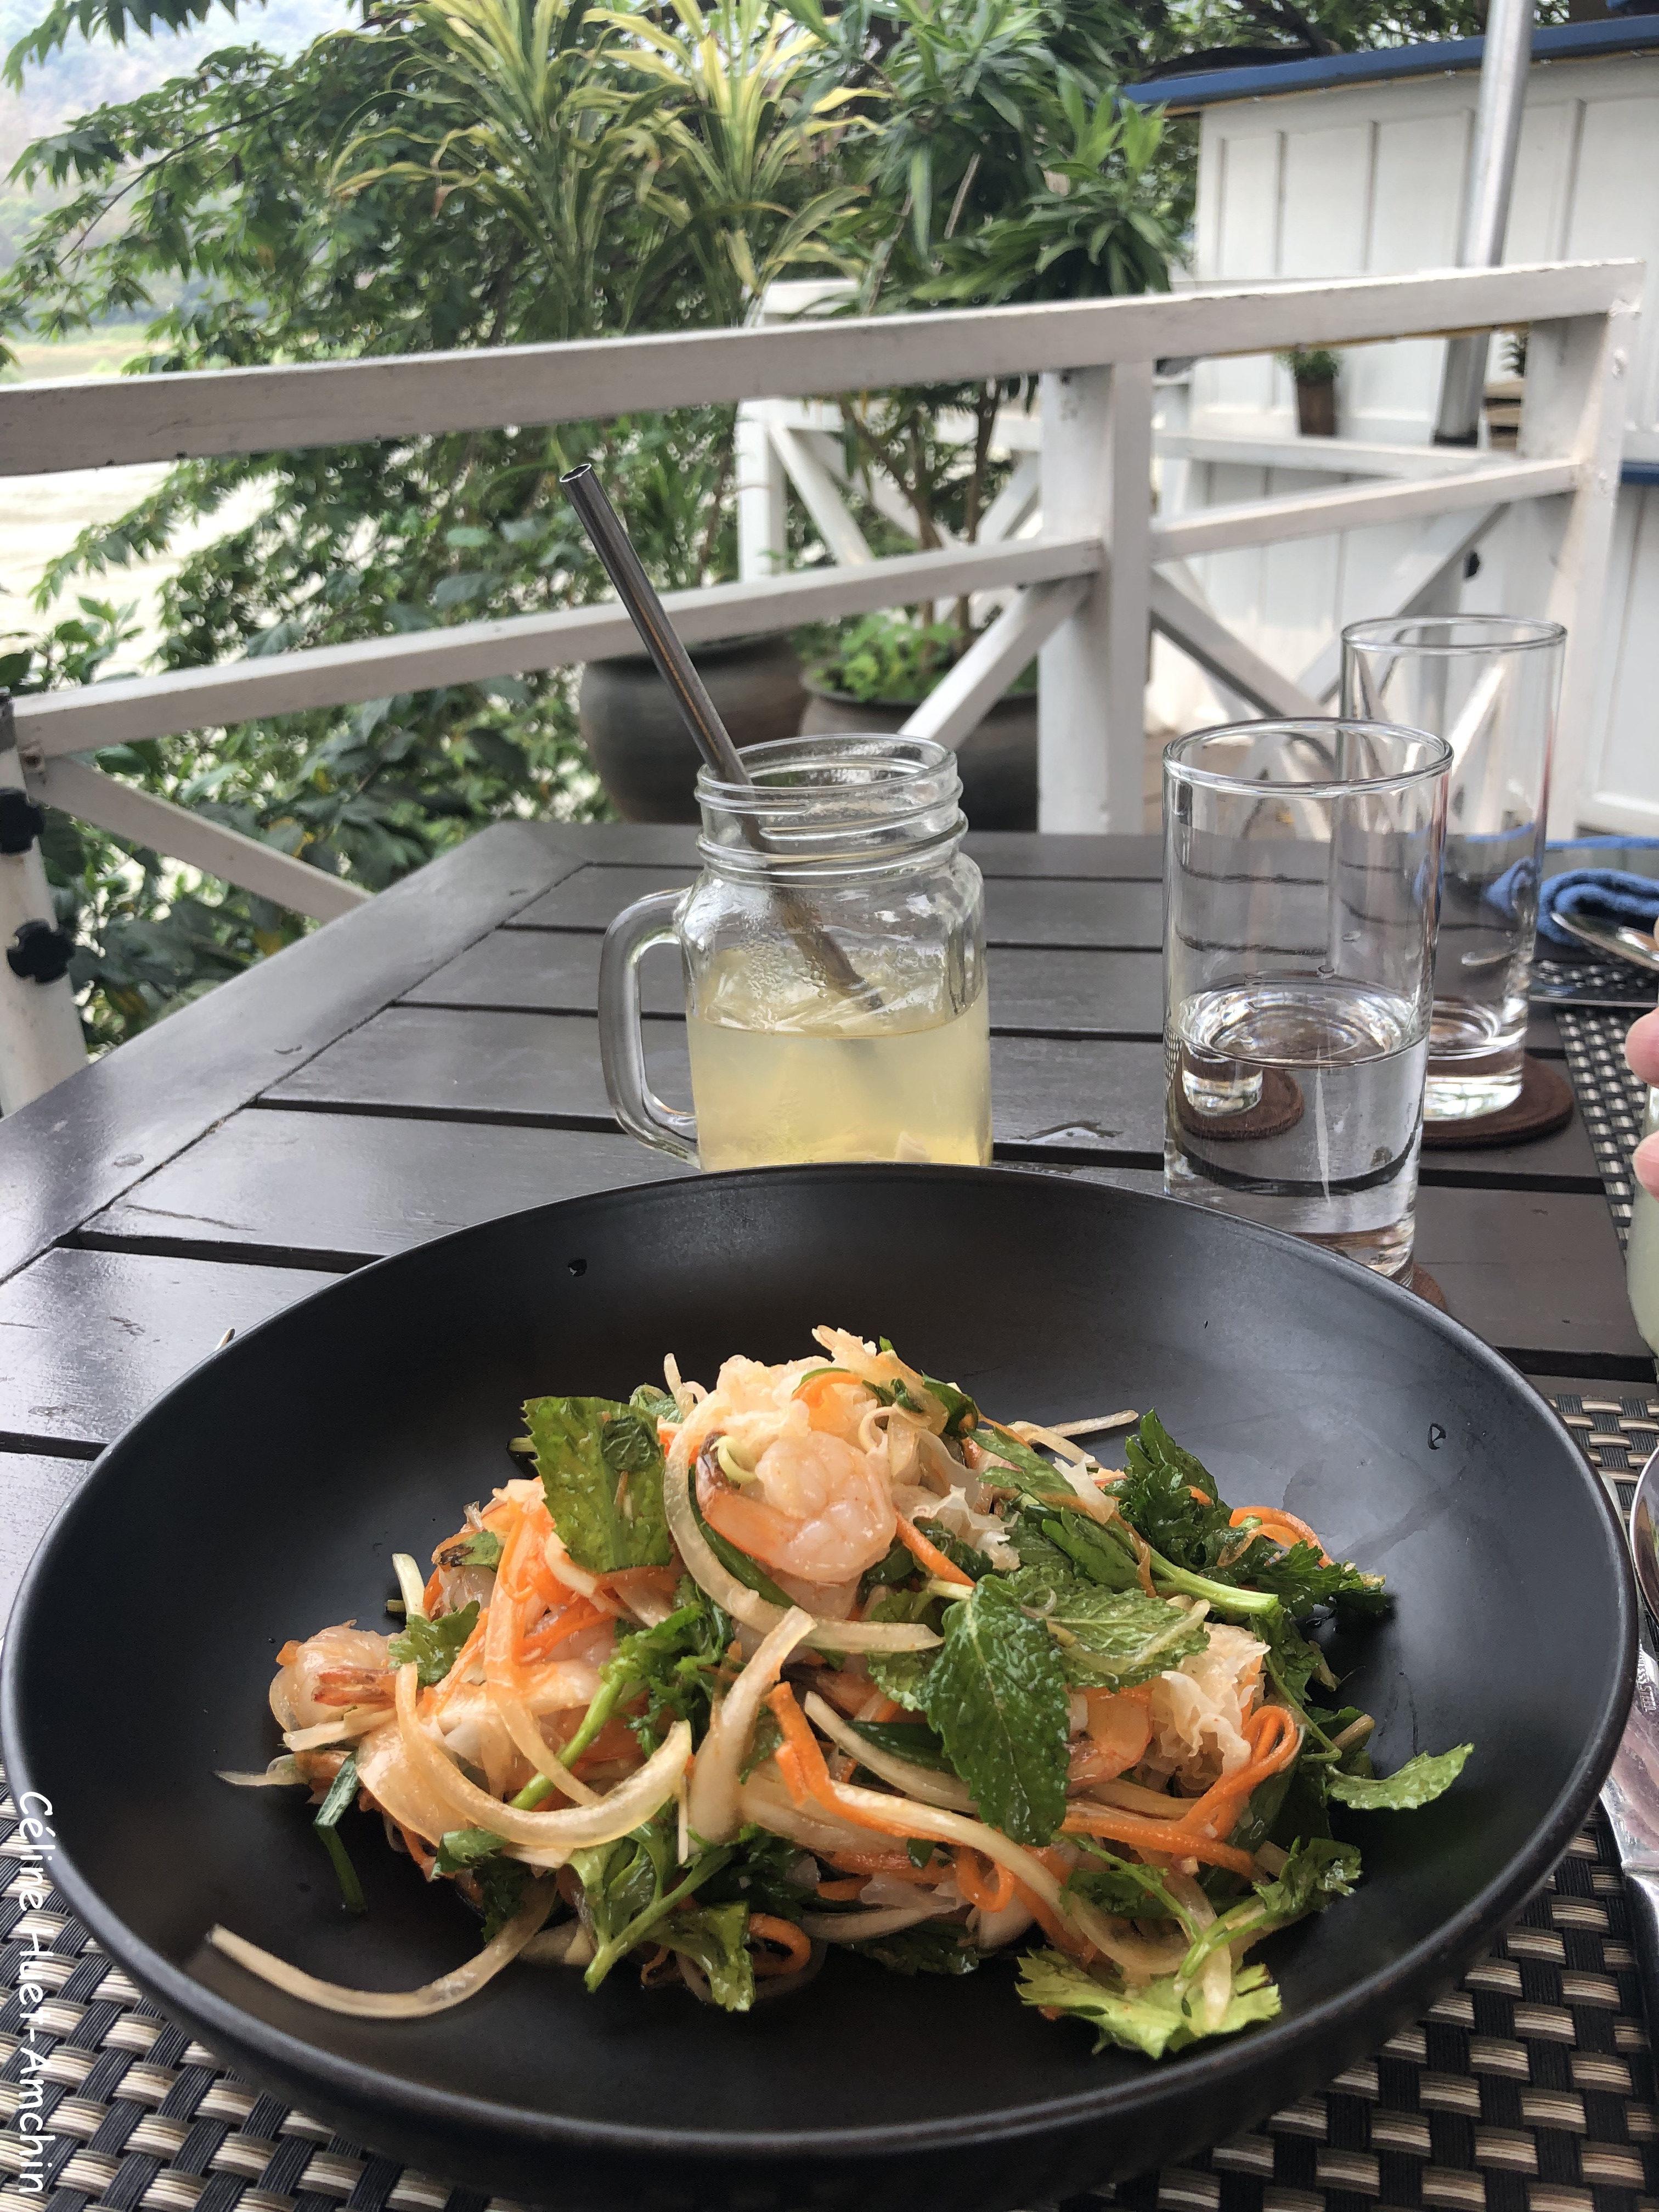 Luang Prabang Salad The Belle Rive terrace Hotel Luang Prabang Laos Asie